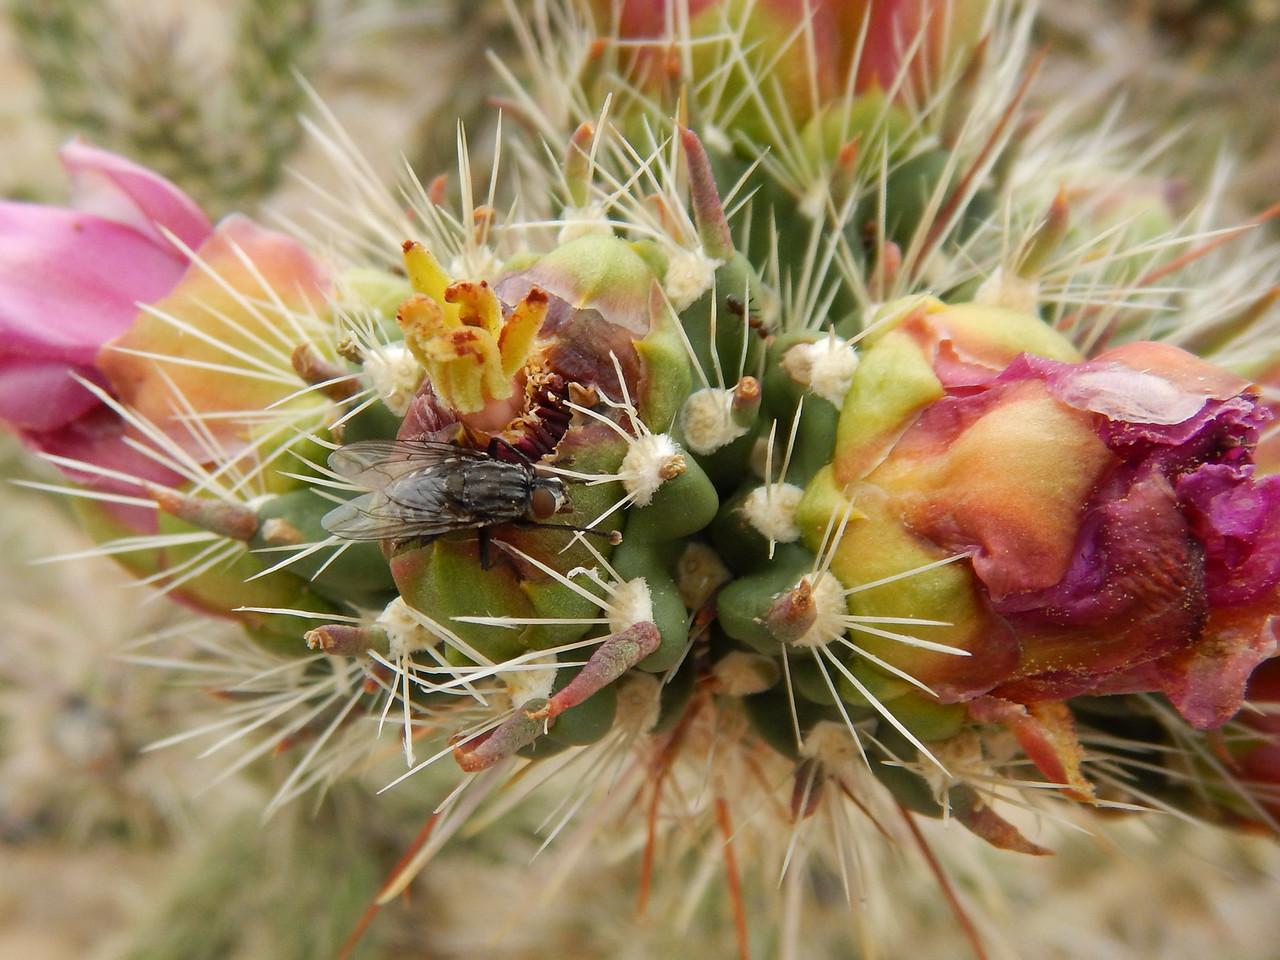 Fly On Cacti Flower